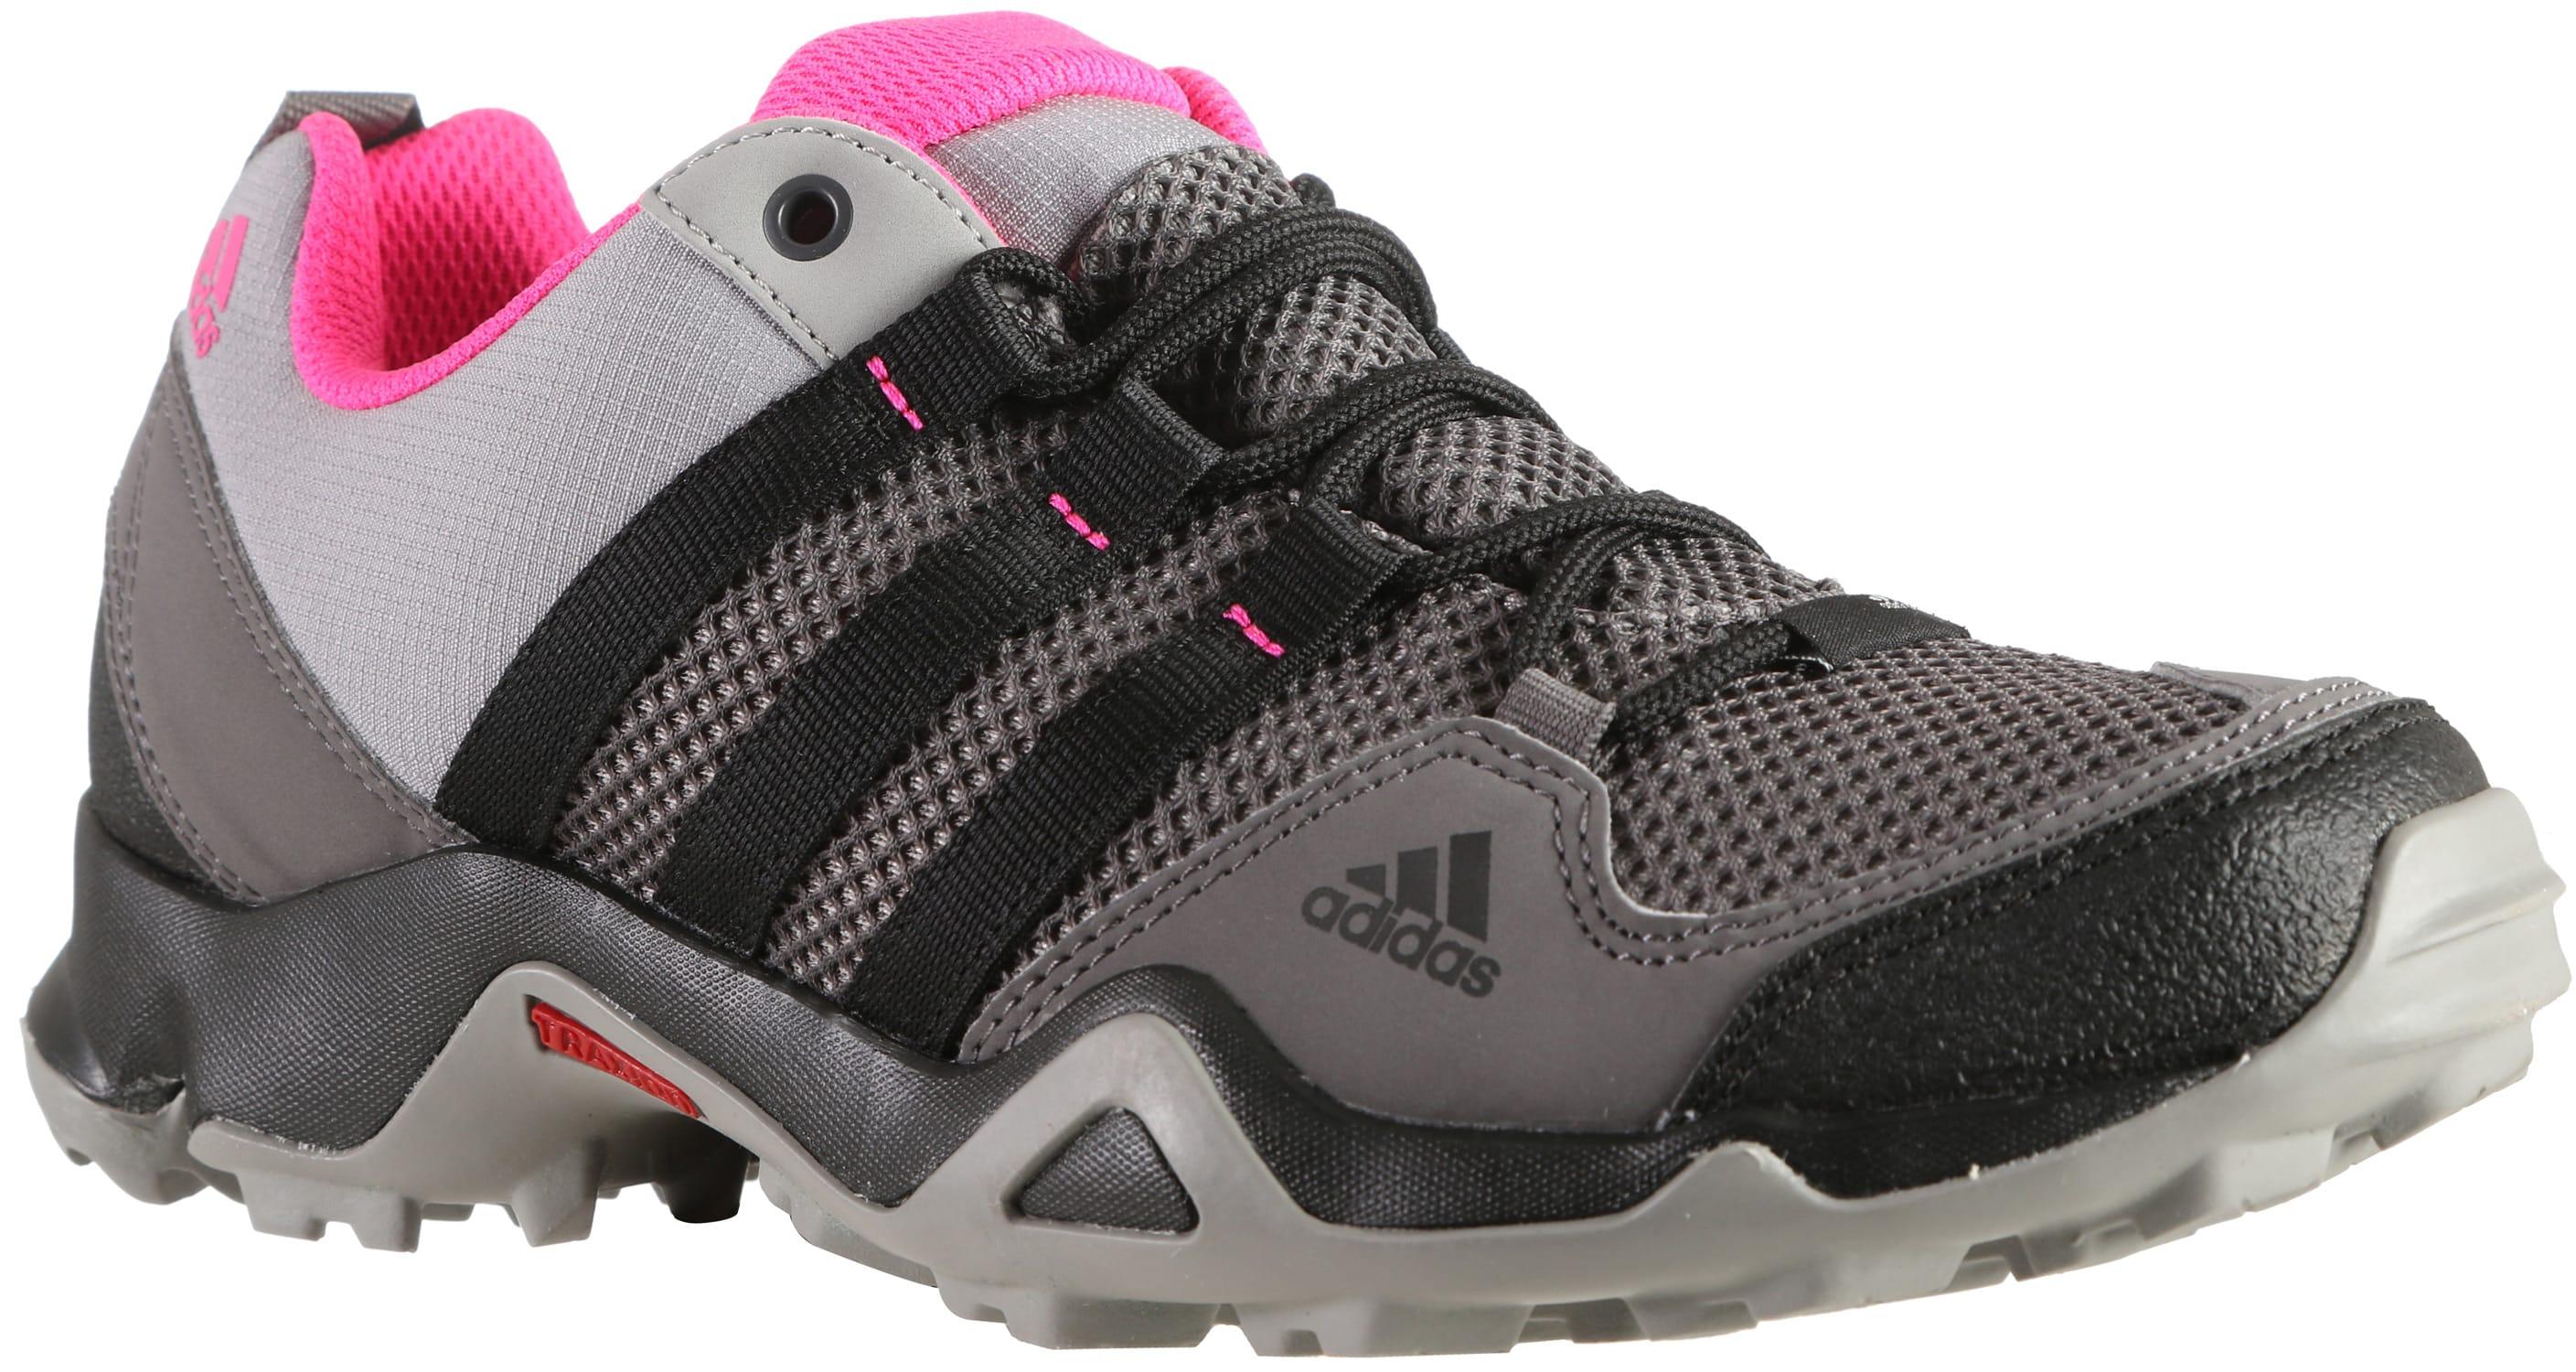 in vendita adidas ax2 scarpe da trekking donne fino a 45%